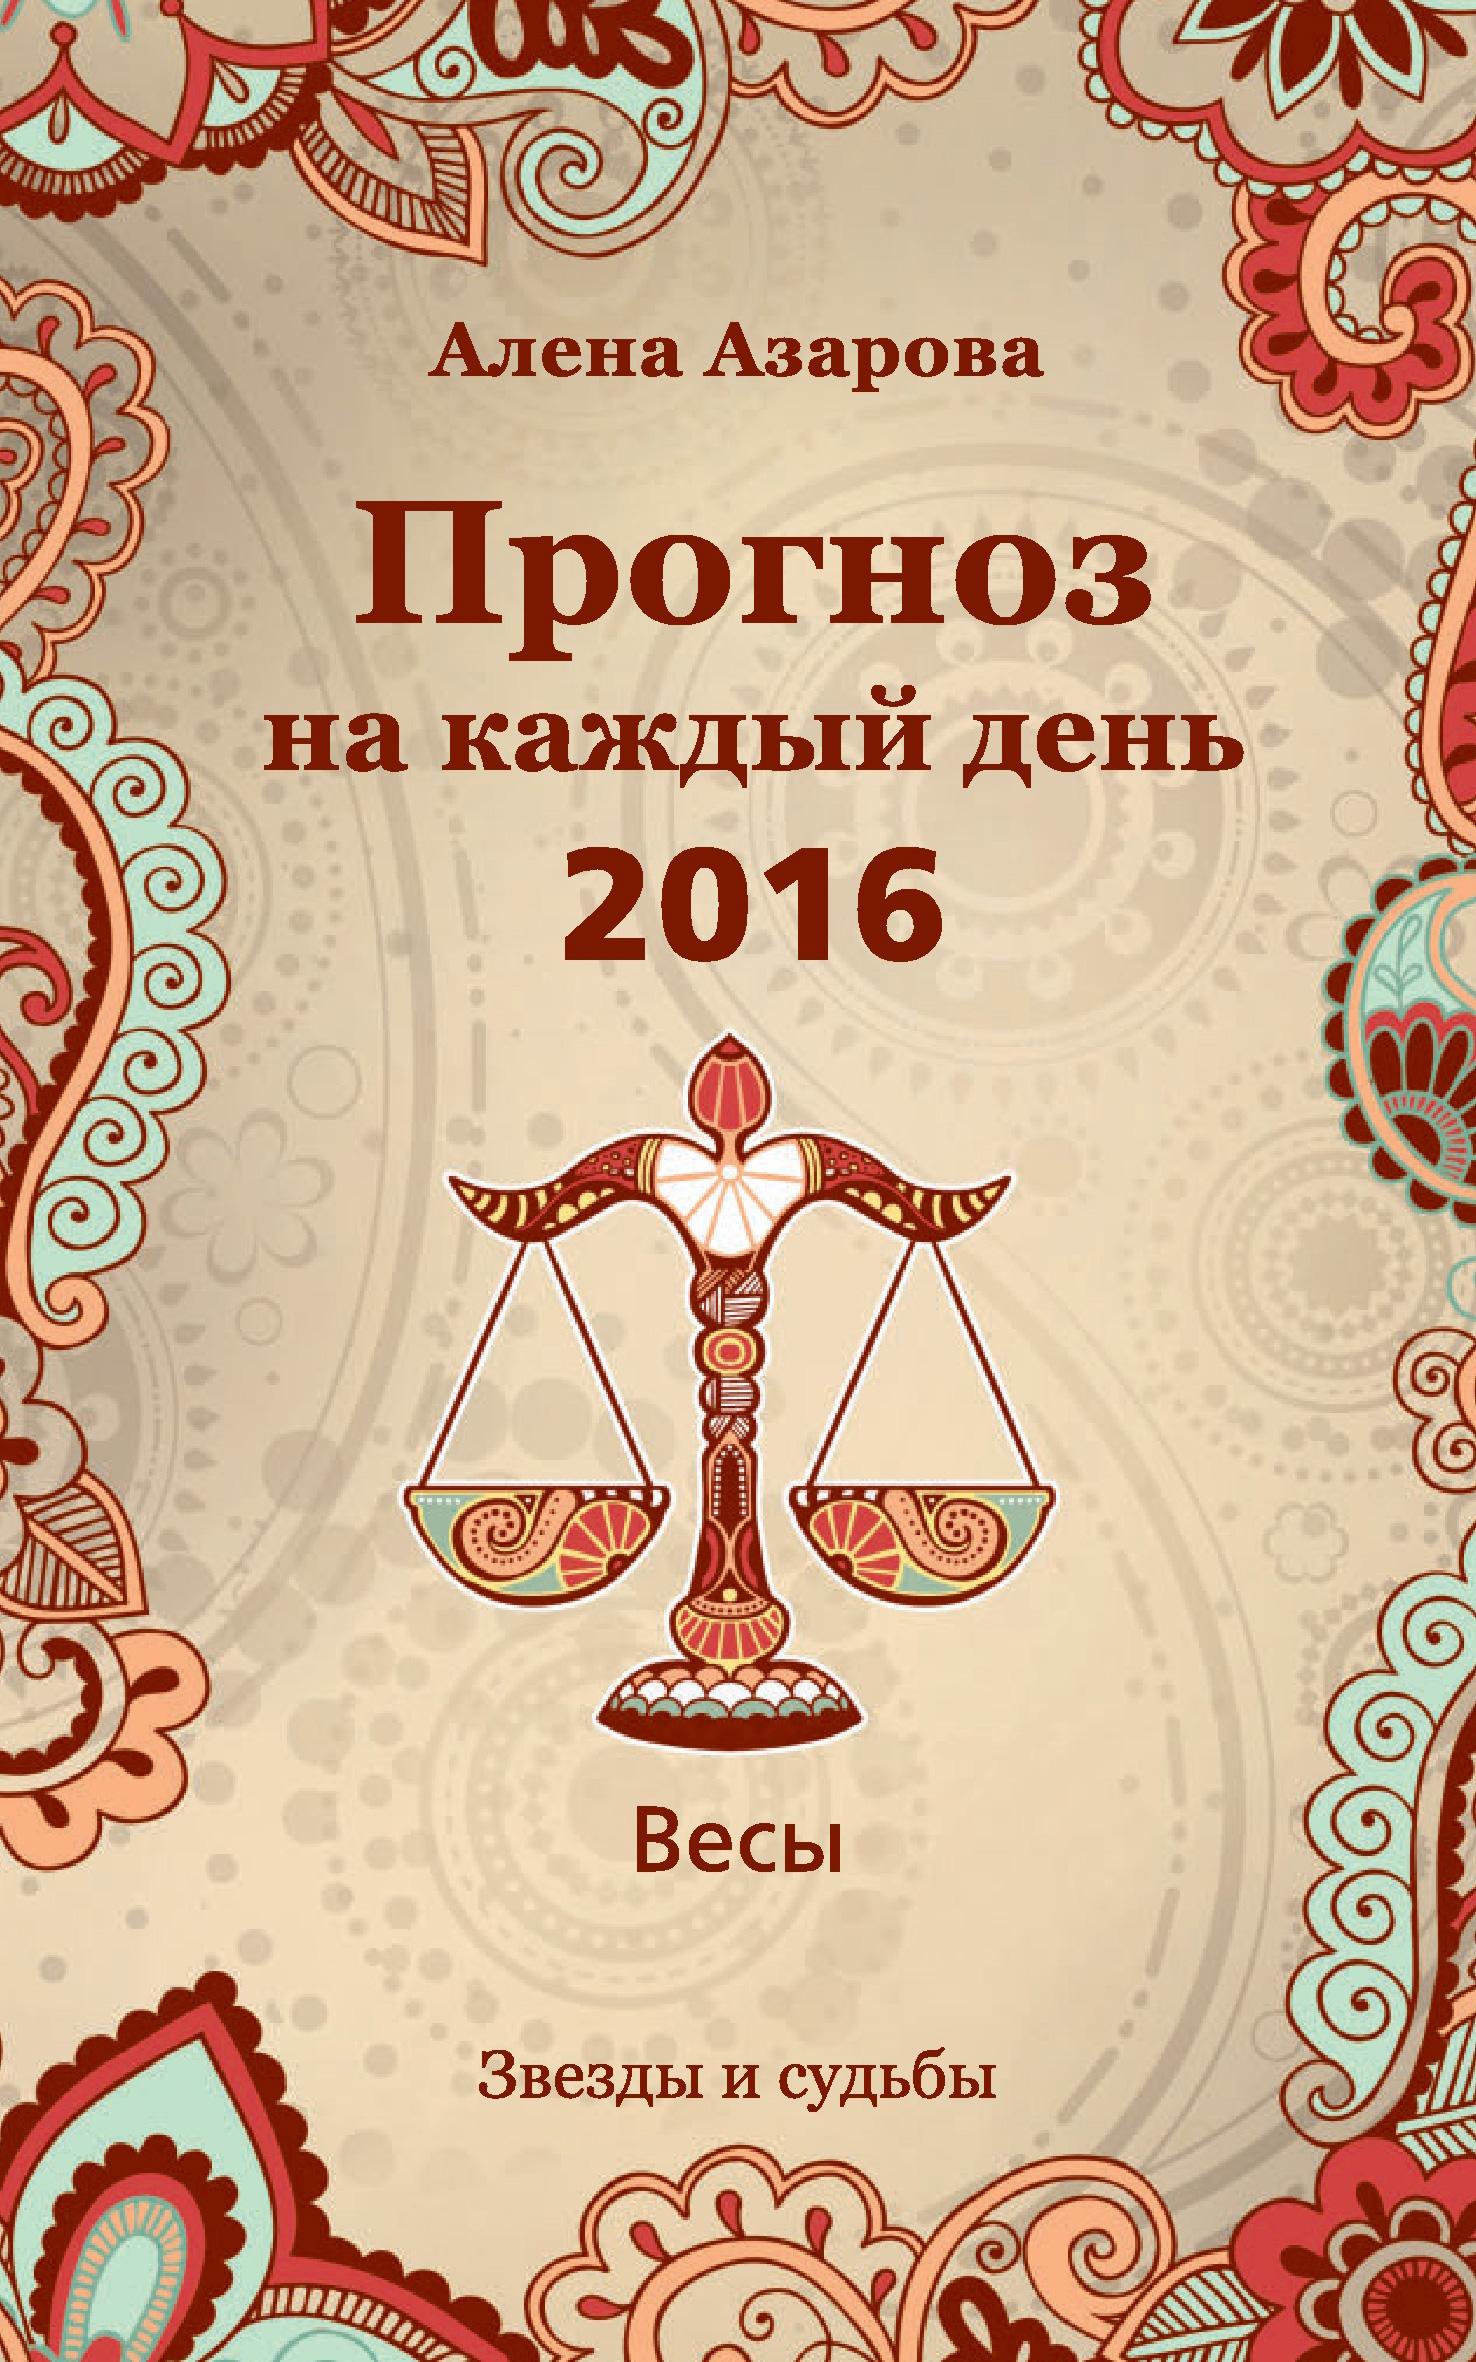 Алена Азарова Прогноз на каждый день. 2016 год. Весы алена азарова прогноз на каждый день 2016 год скорпион